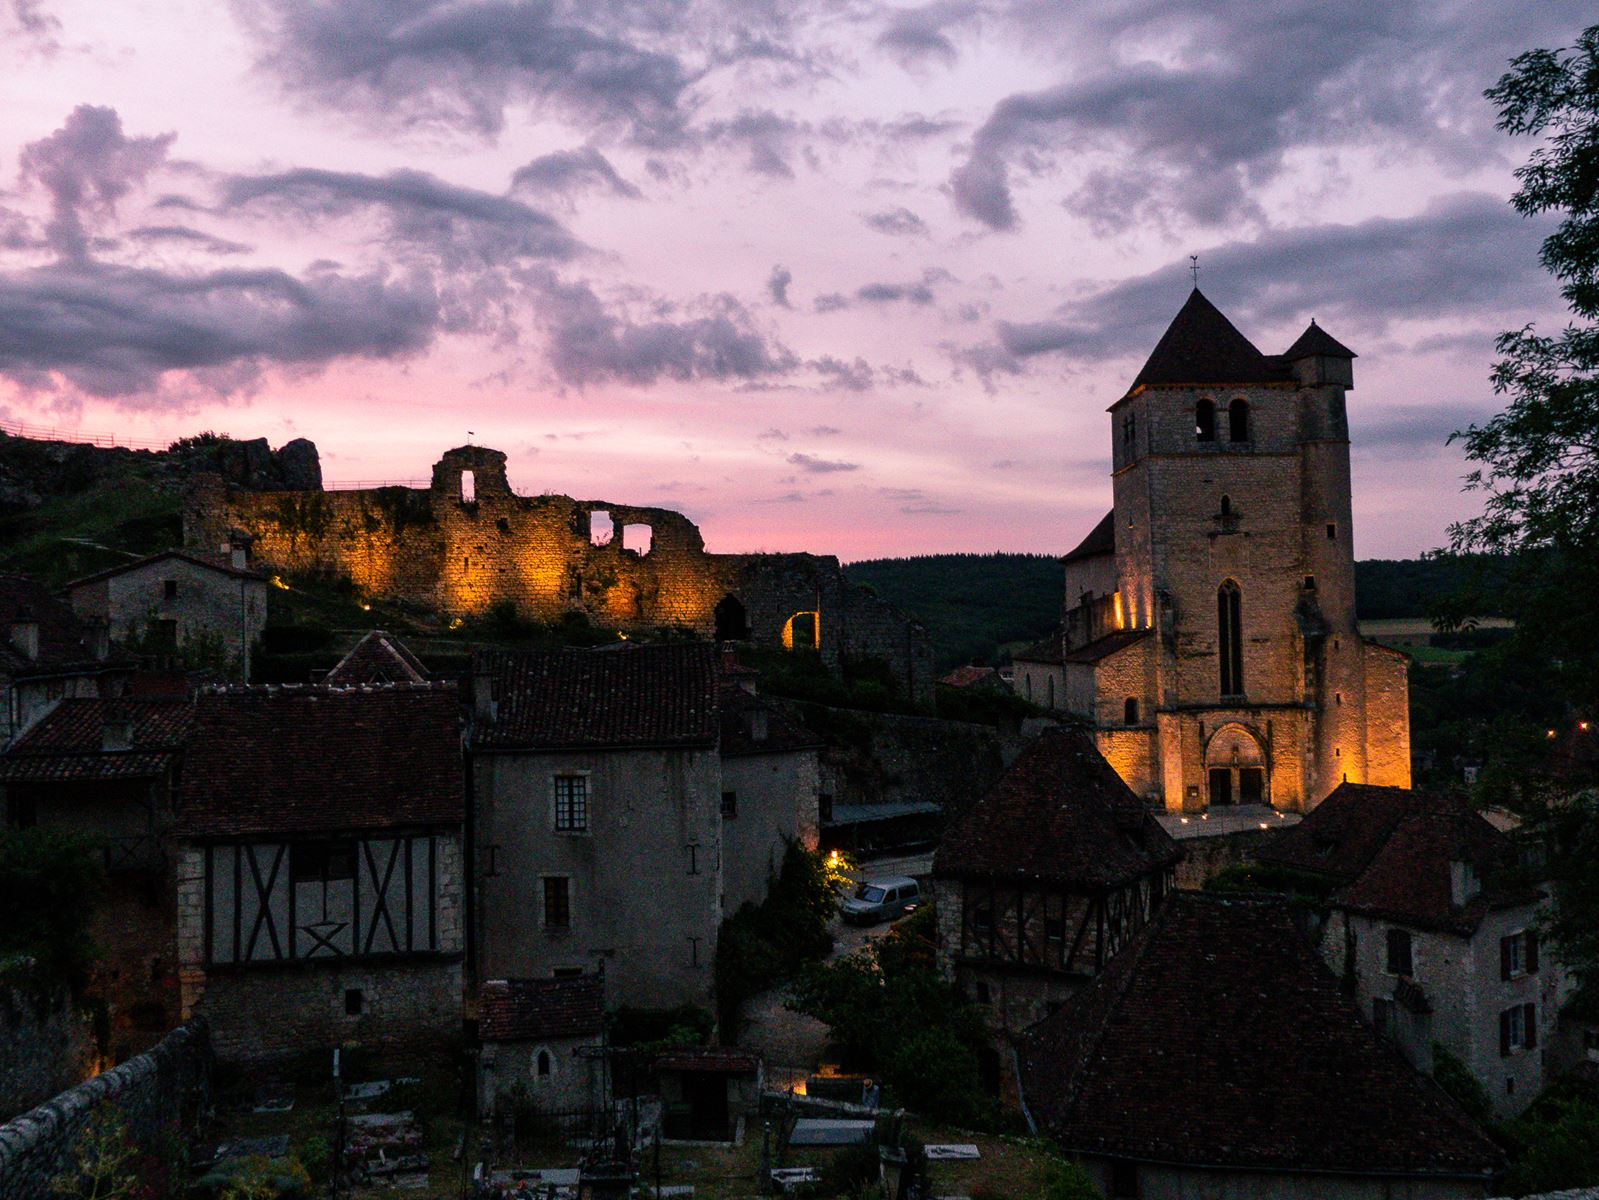 Saint Cirq Lapopie by night